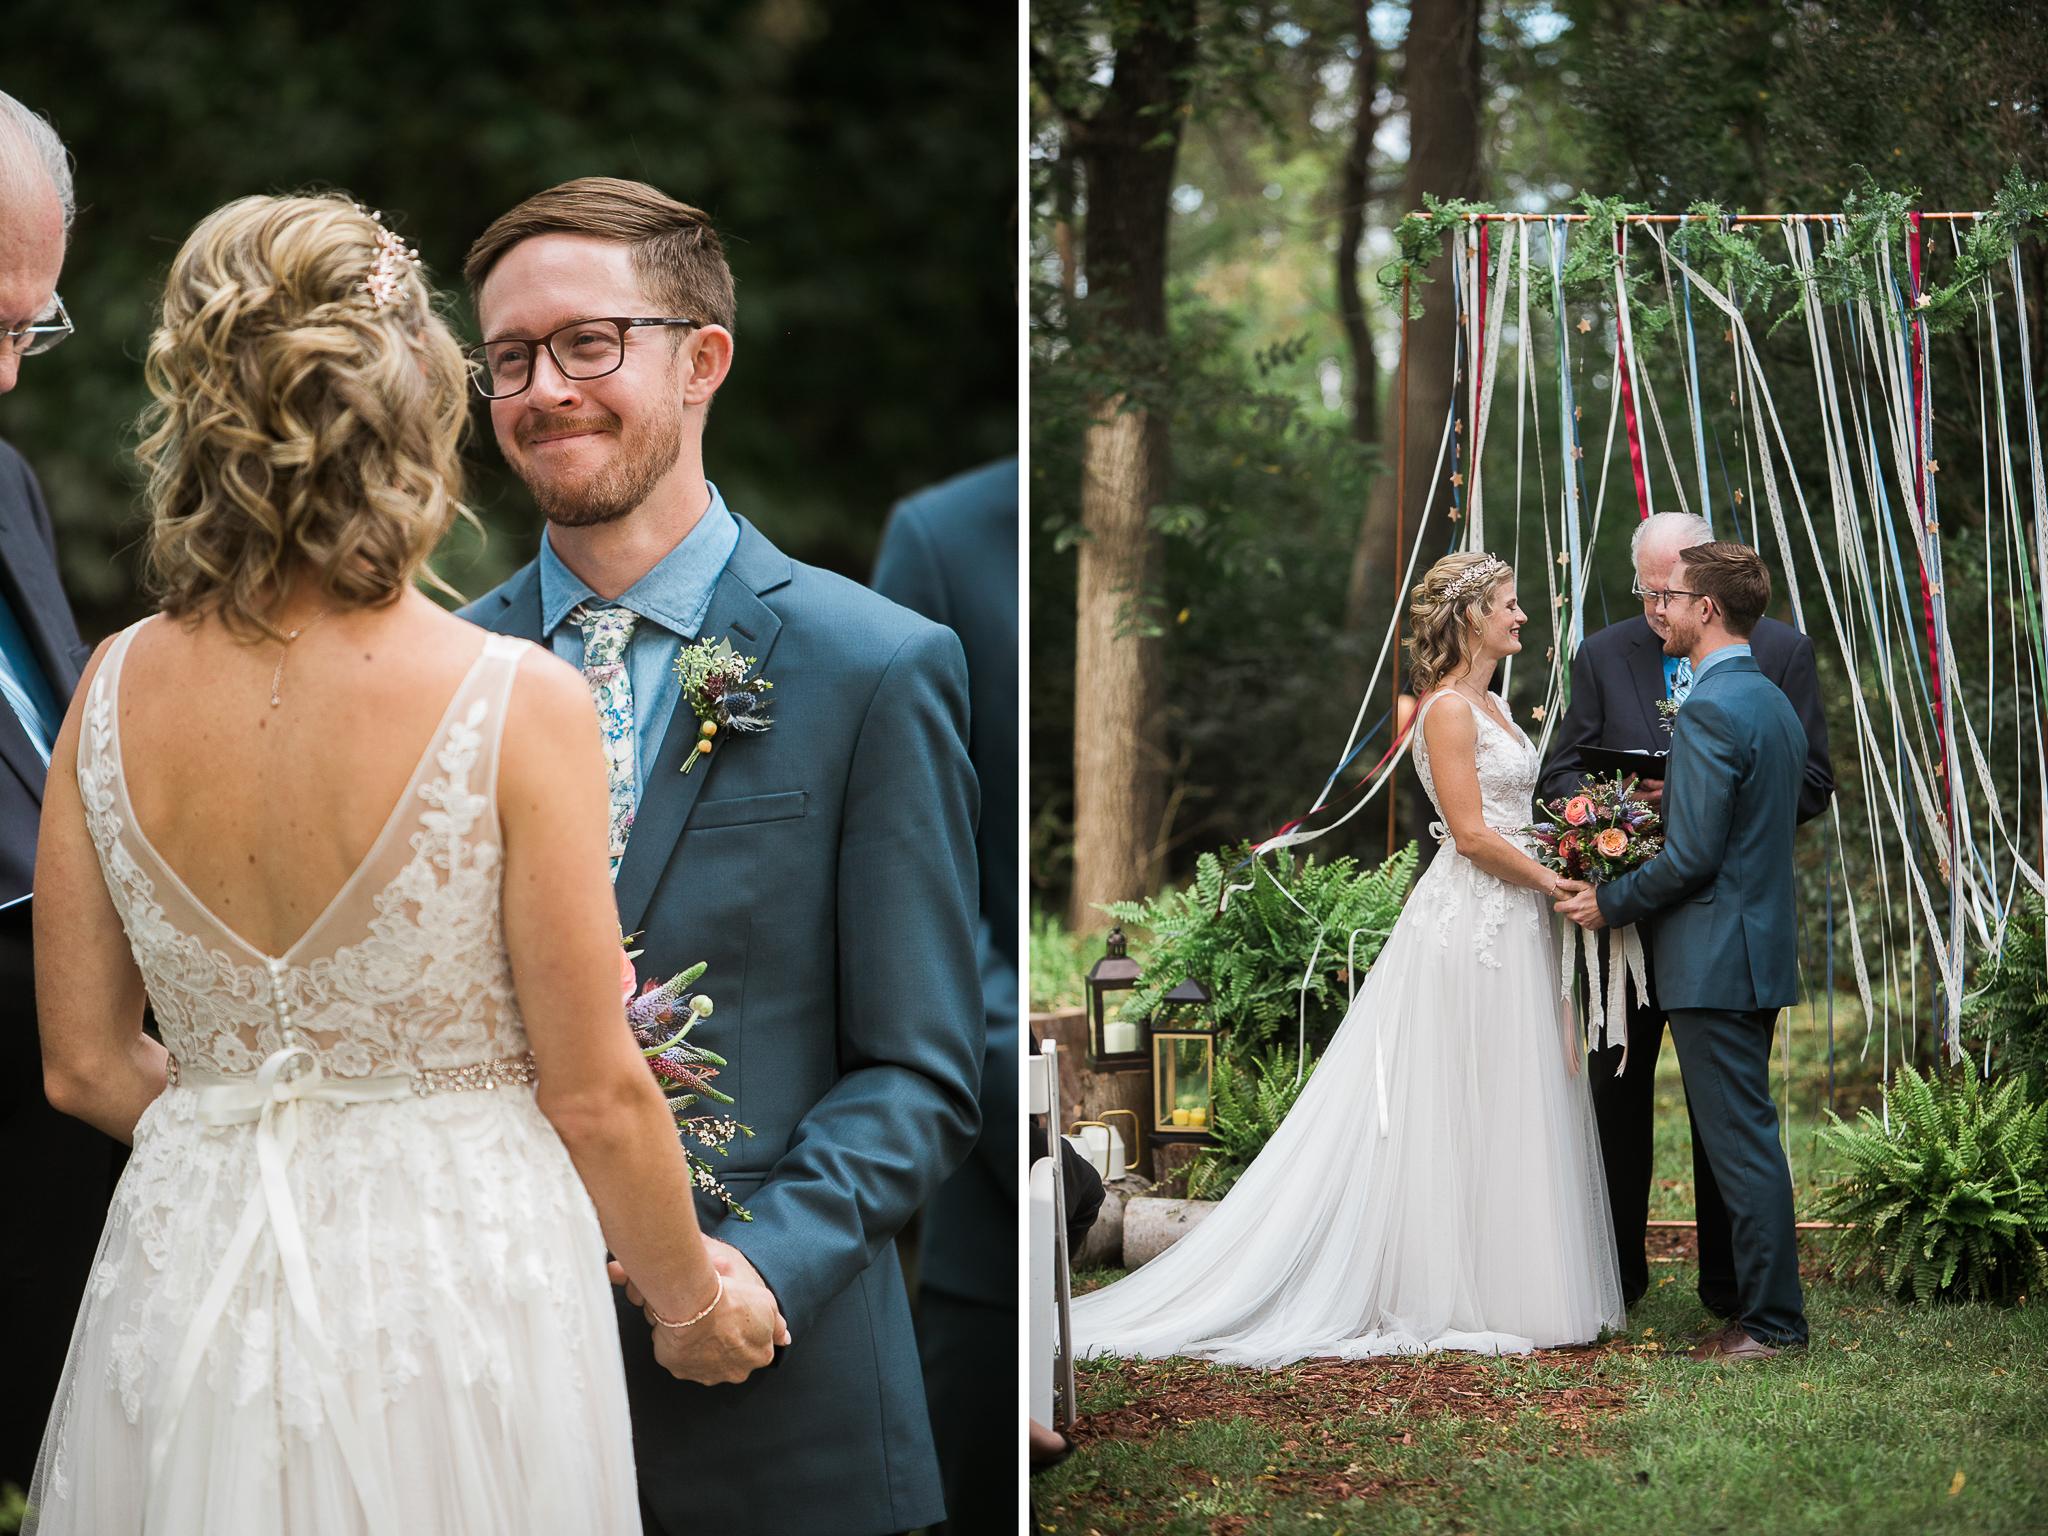 Paoli-Mill-wedding-summer-Wisconsin_096.jpg